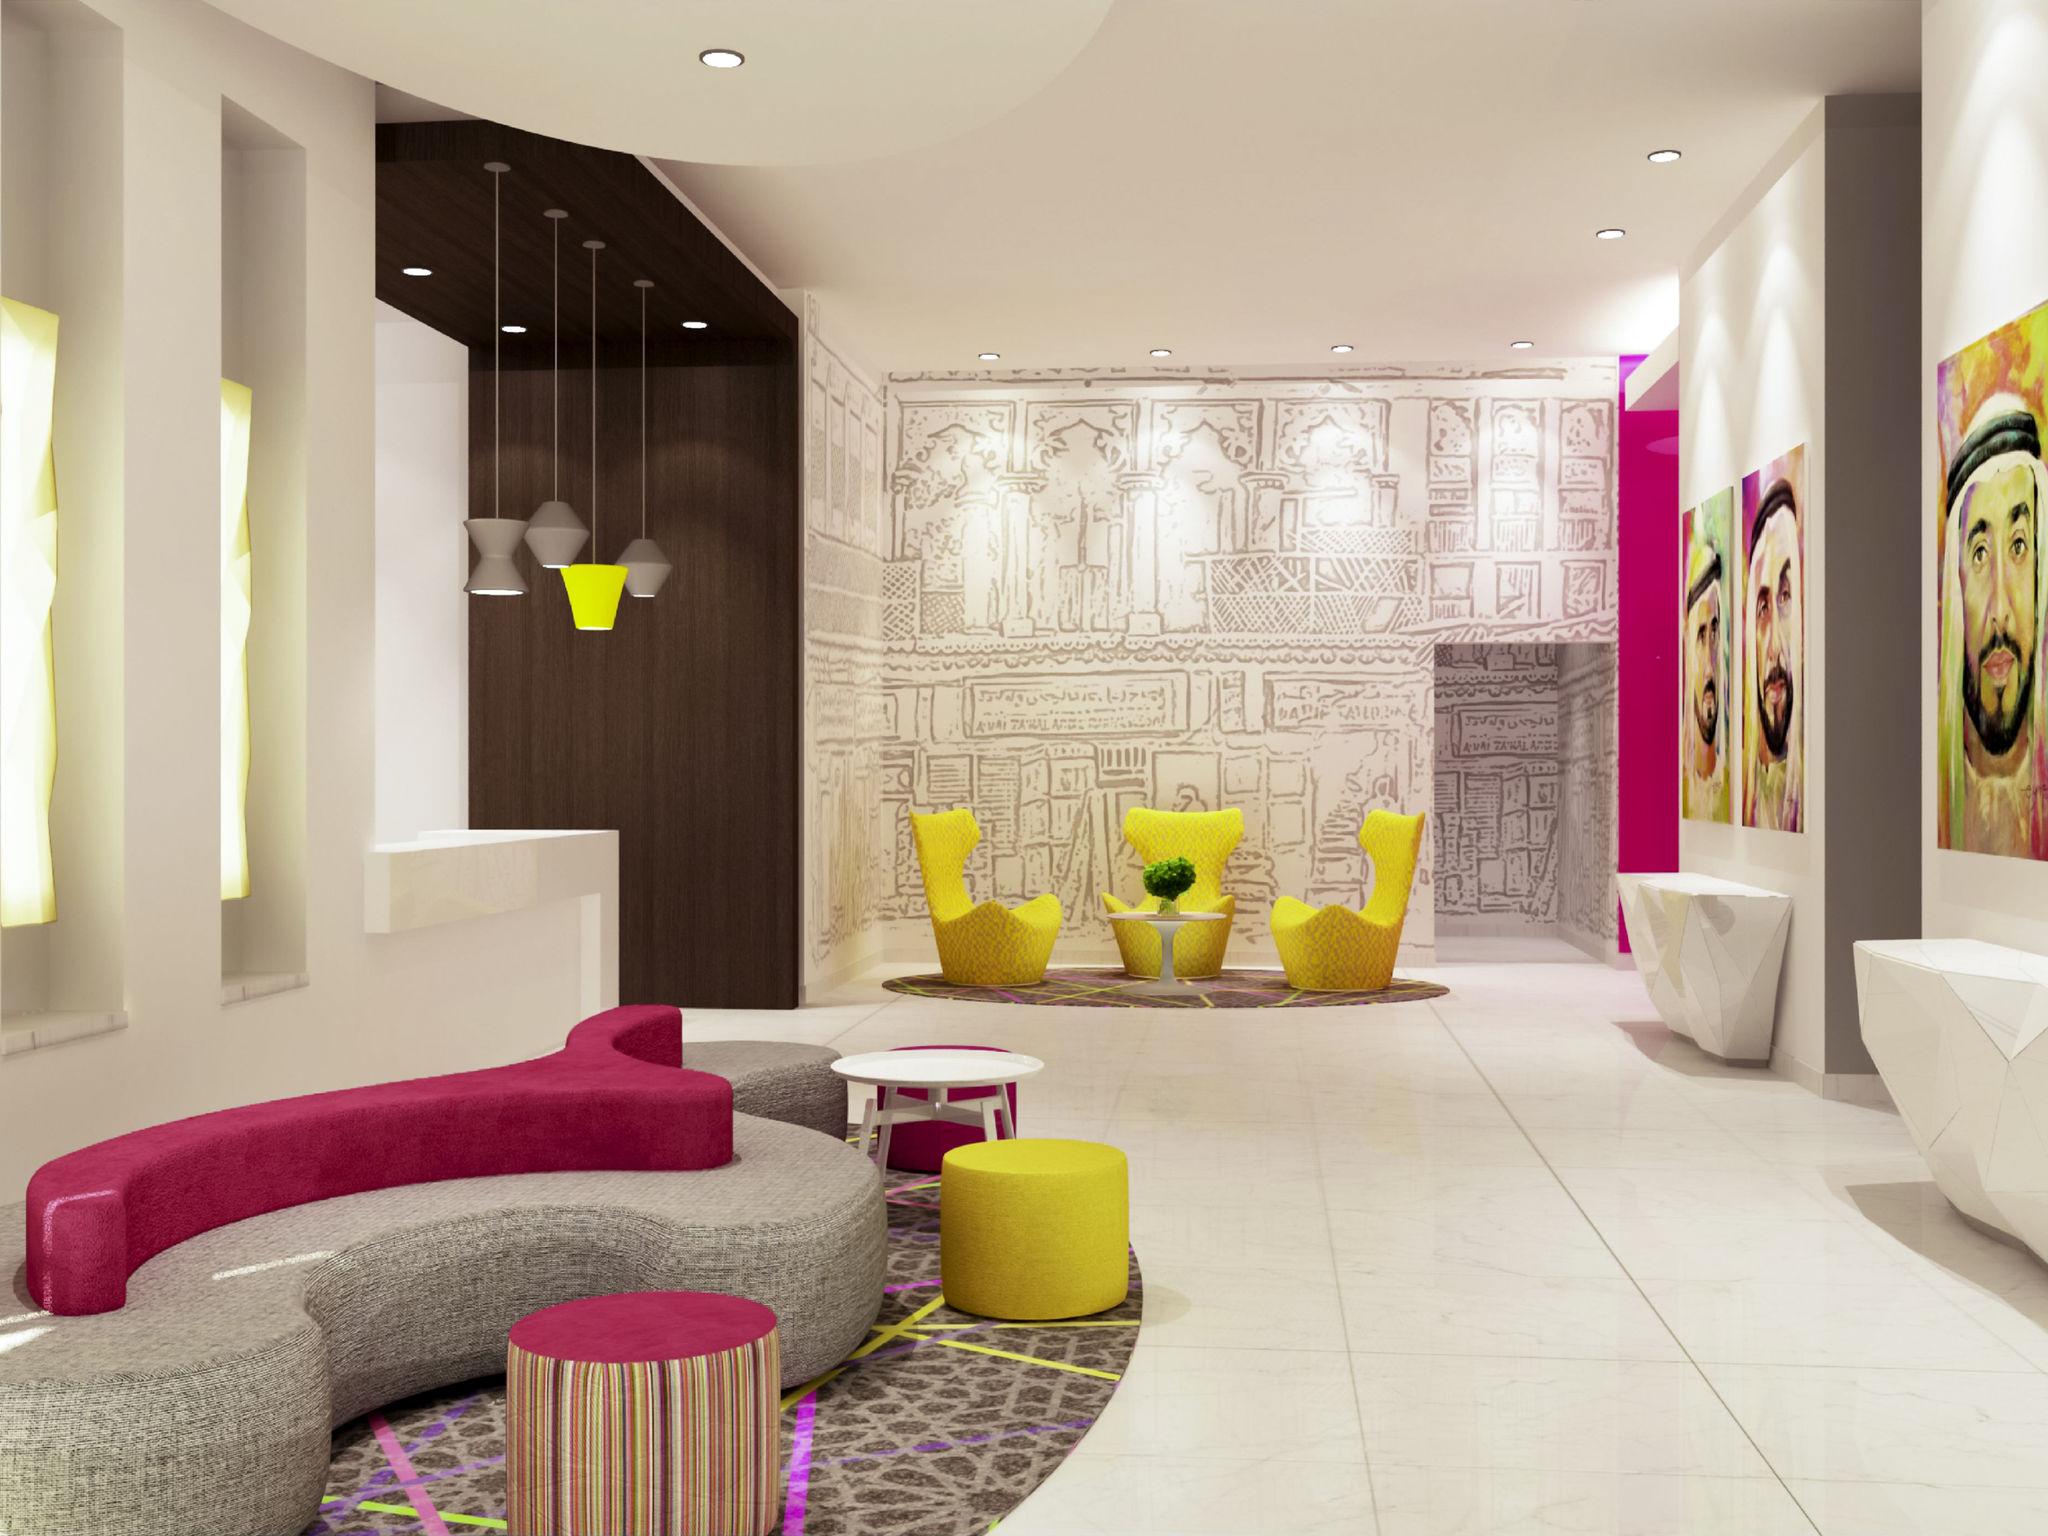 Hotel – Al Majaz Hotel Sharjah - beheer door AccorHotels